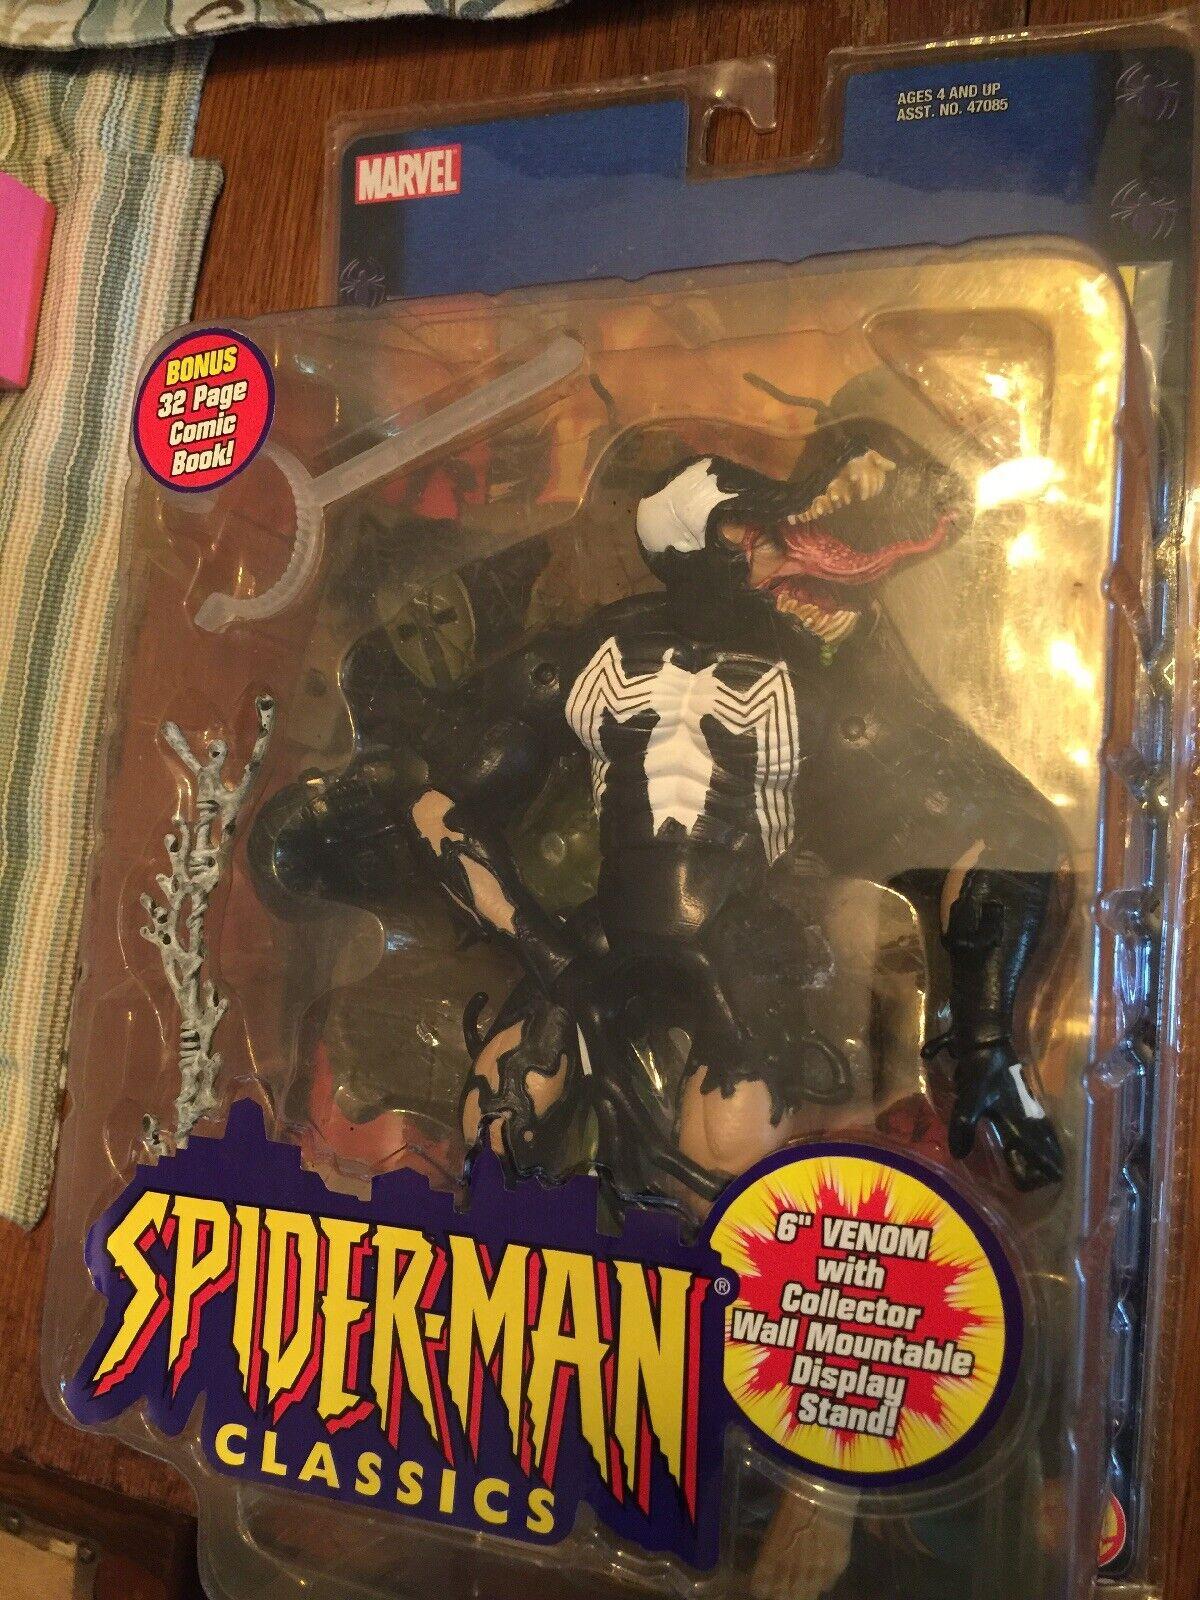 Marvel SPIDER-MAN CLASSICS VENOM W  32 Page Comic & Wall Mount Toy biz NIP